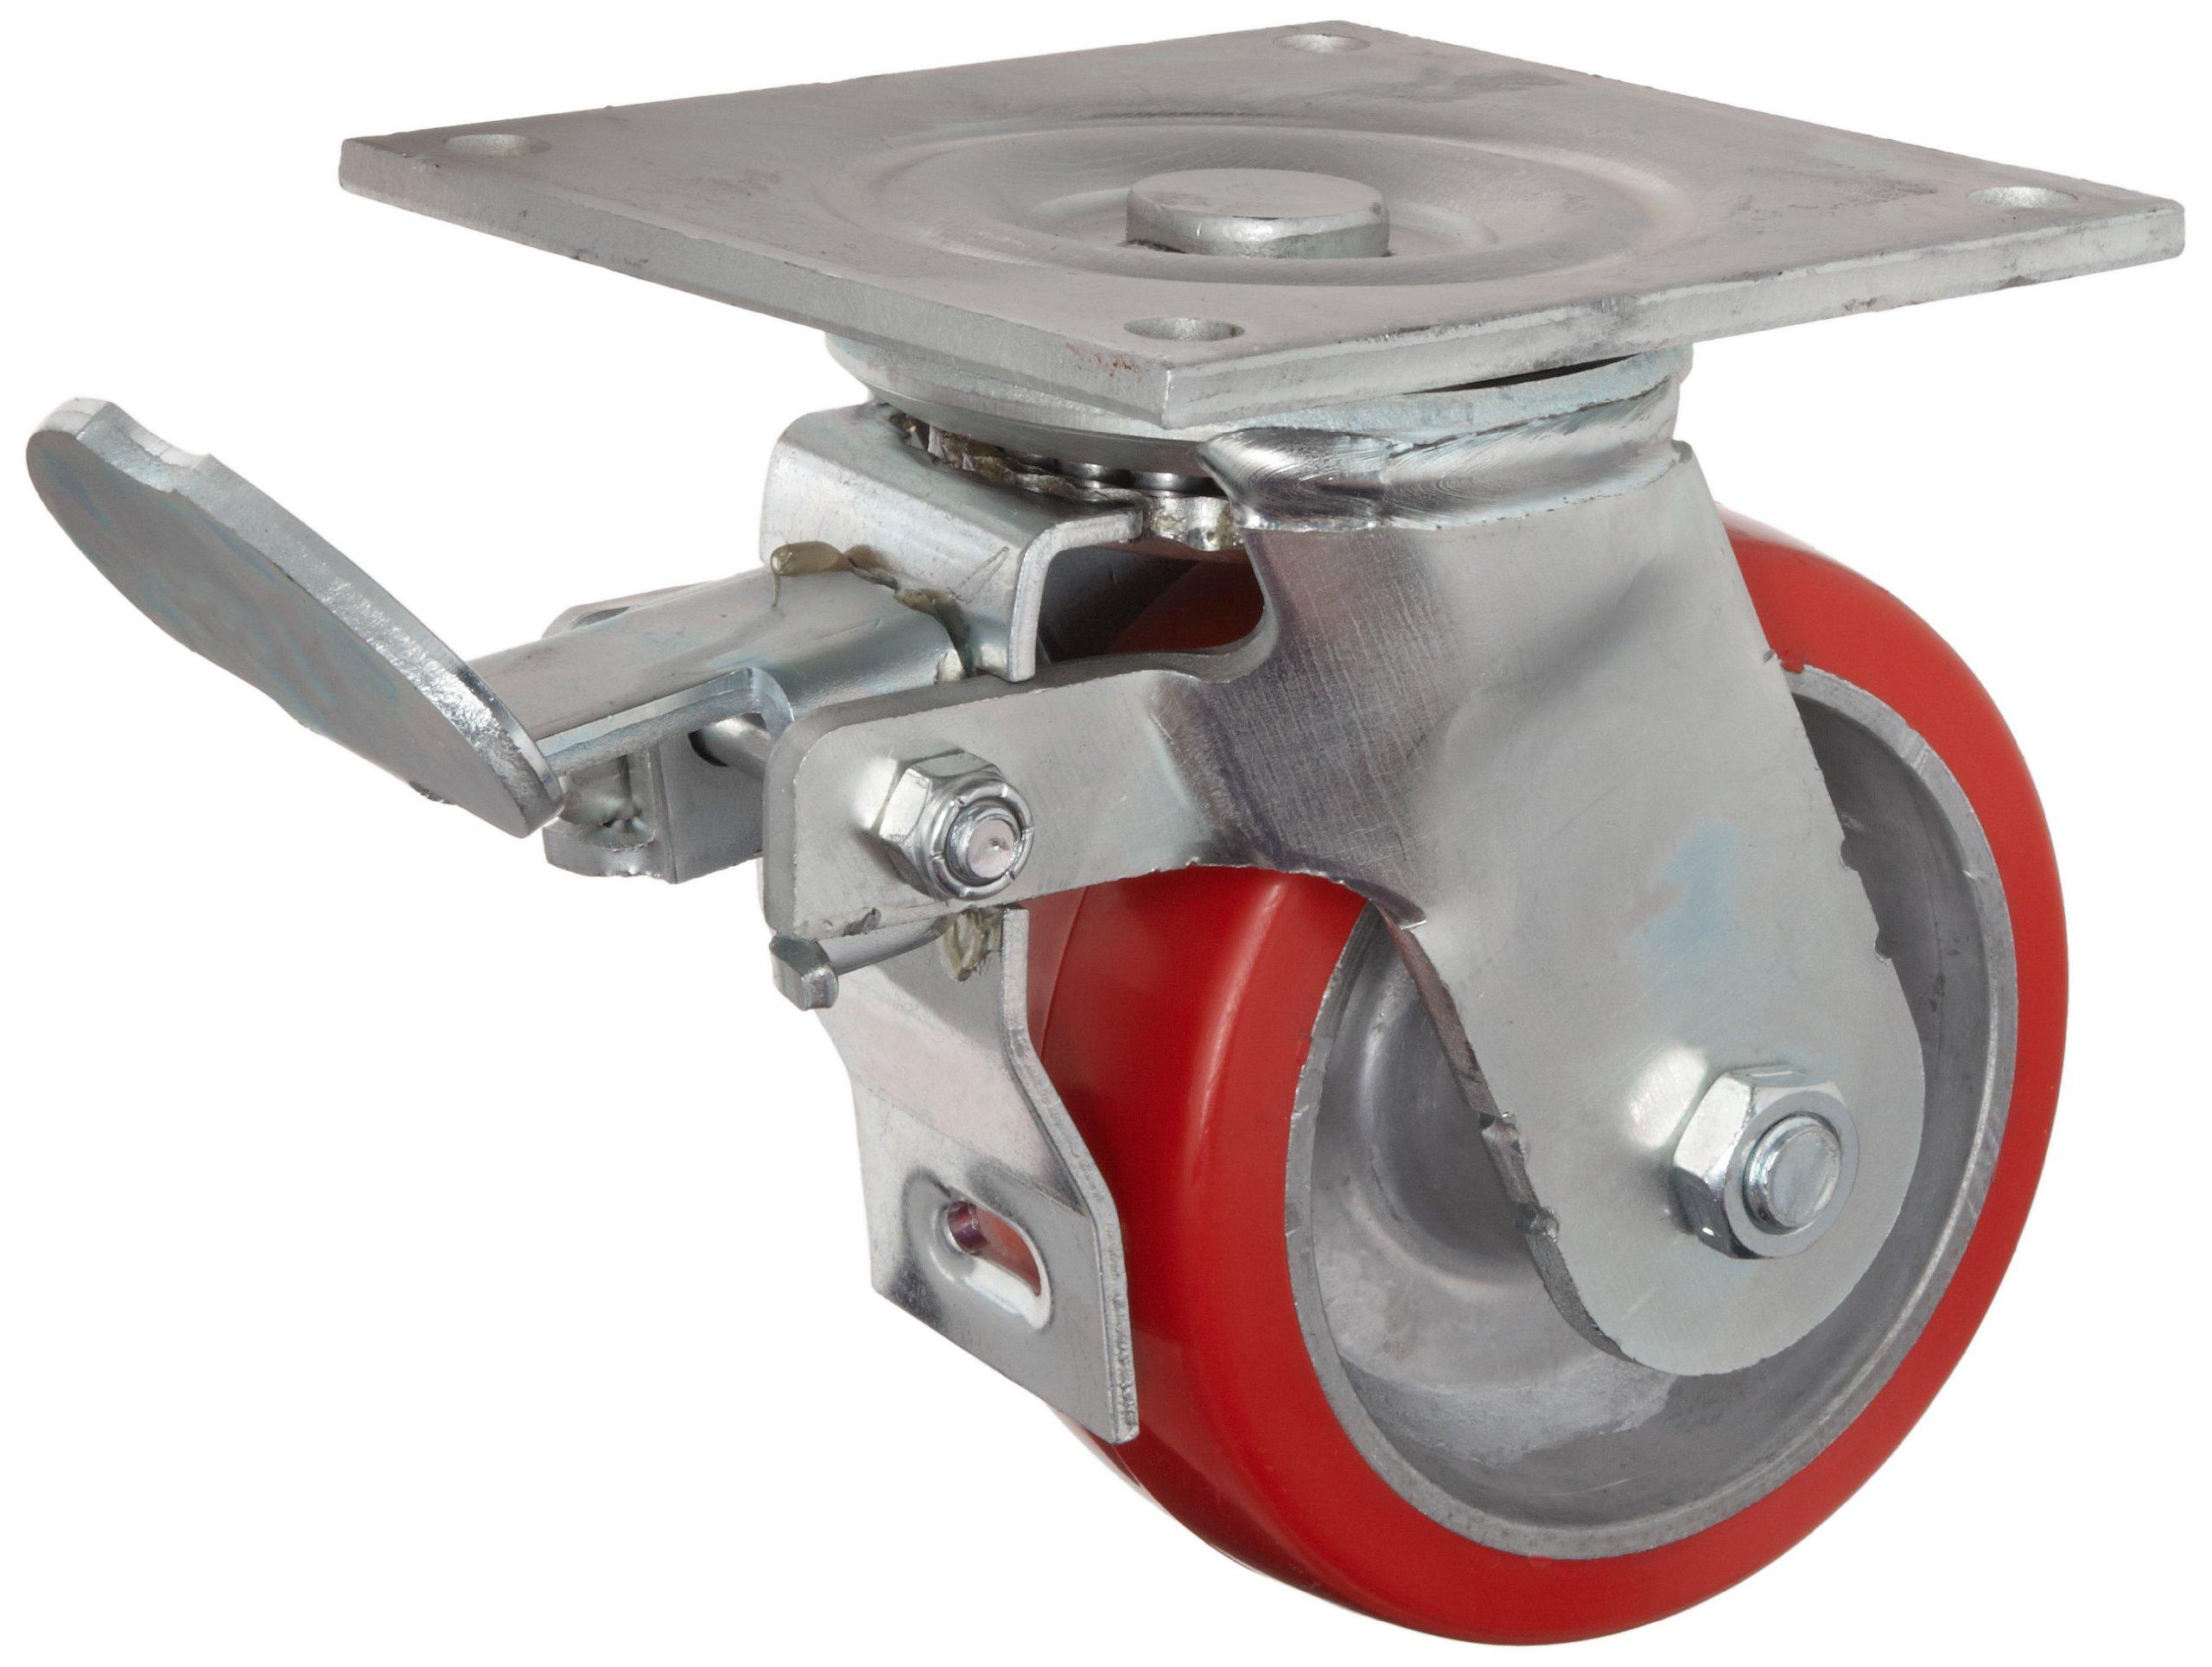 E.R. Wagner Plate Caster, Swivel with Total-Lock Brake, Polyurethane on Aluminum Wheel, Roller Bearing, 1200 lbs Capacity, 6'' Wheel Dia, 2'' Wheel Width, 7-1/2'' Mount Height, 4-1/2'' Plate Length, 4'' Plate Width